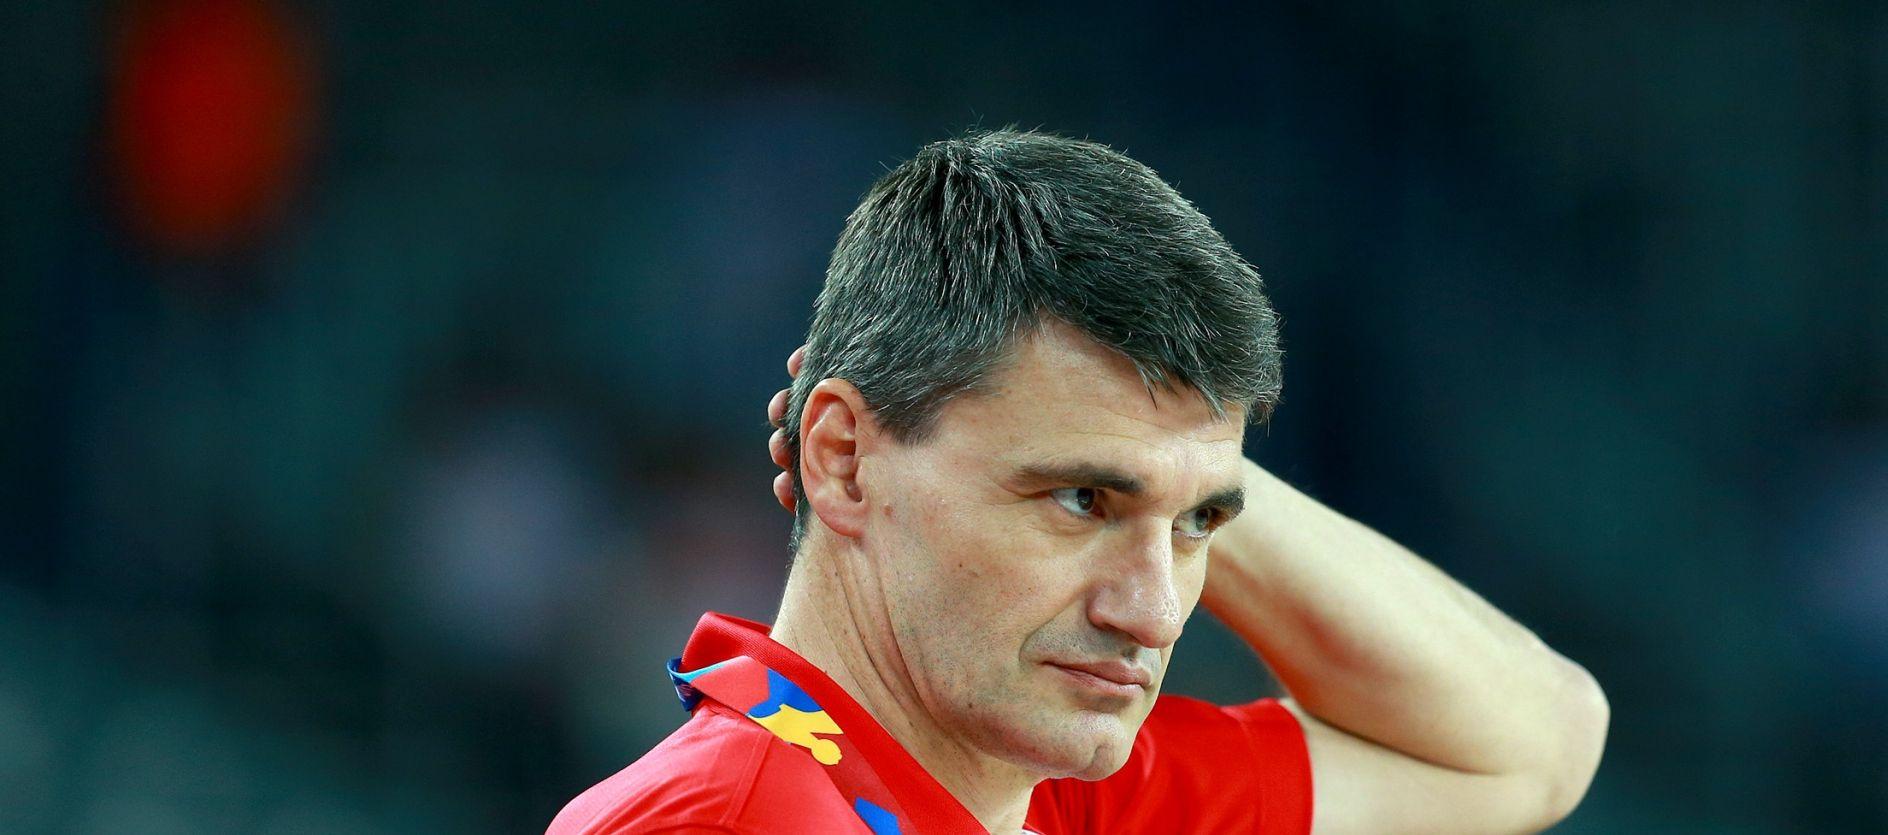 TAKO RADE GENTLMANI Velimir Perasović podnio ostavku nakon debakla